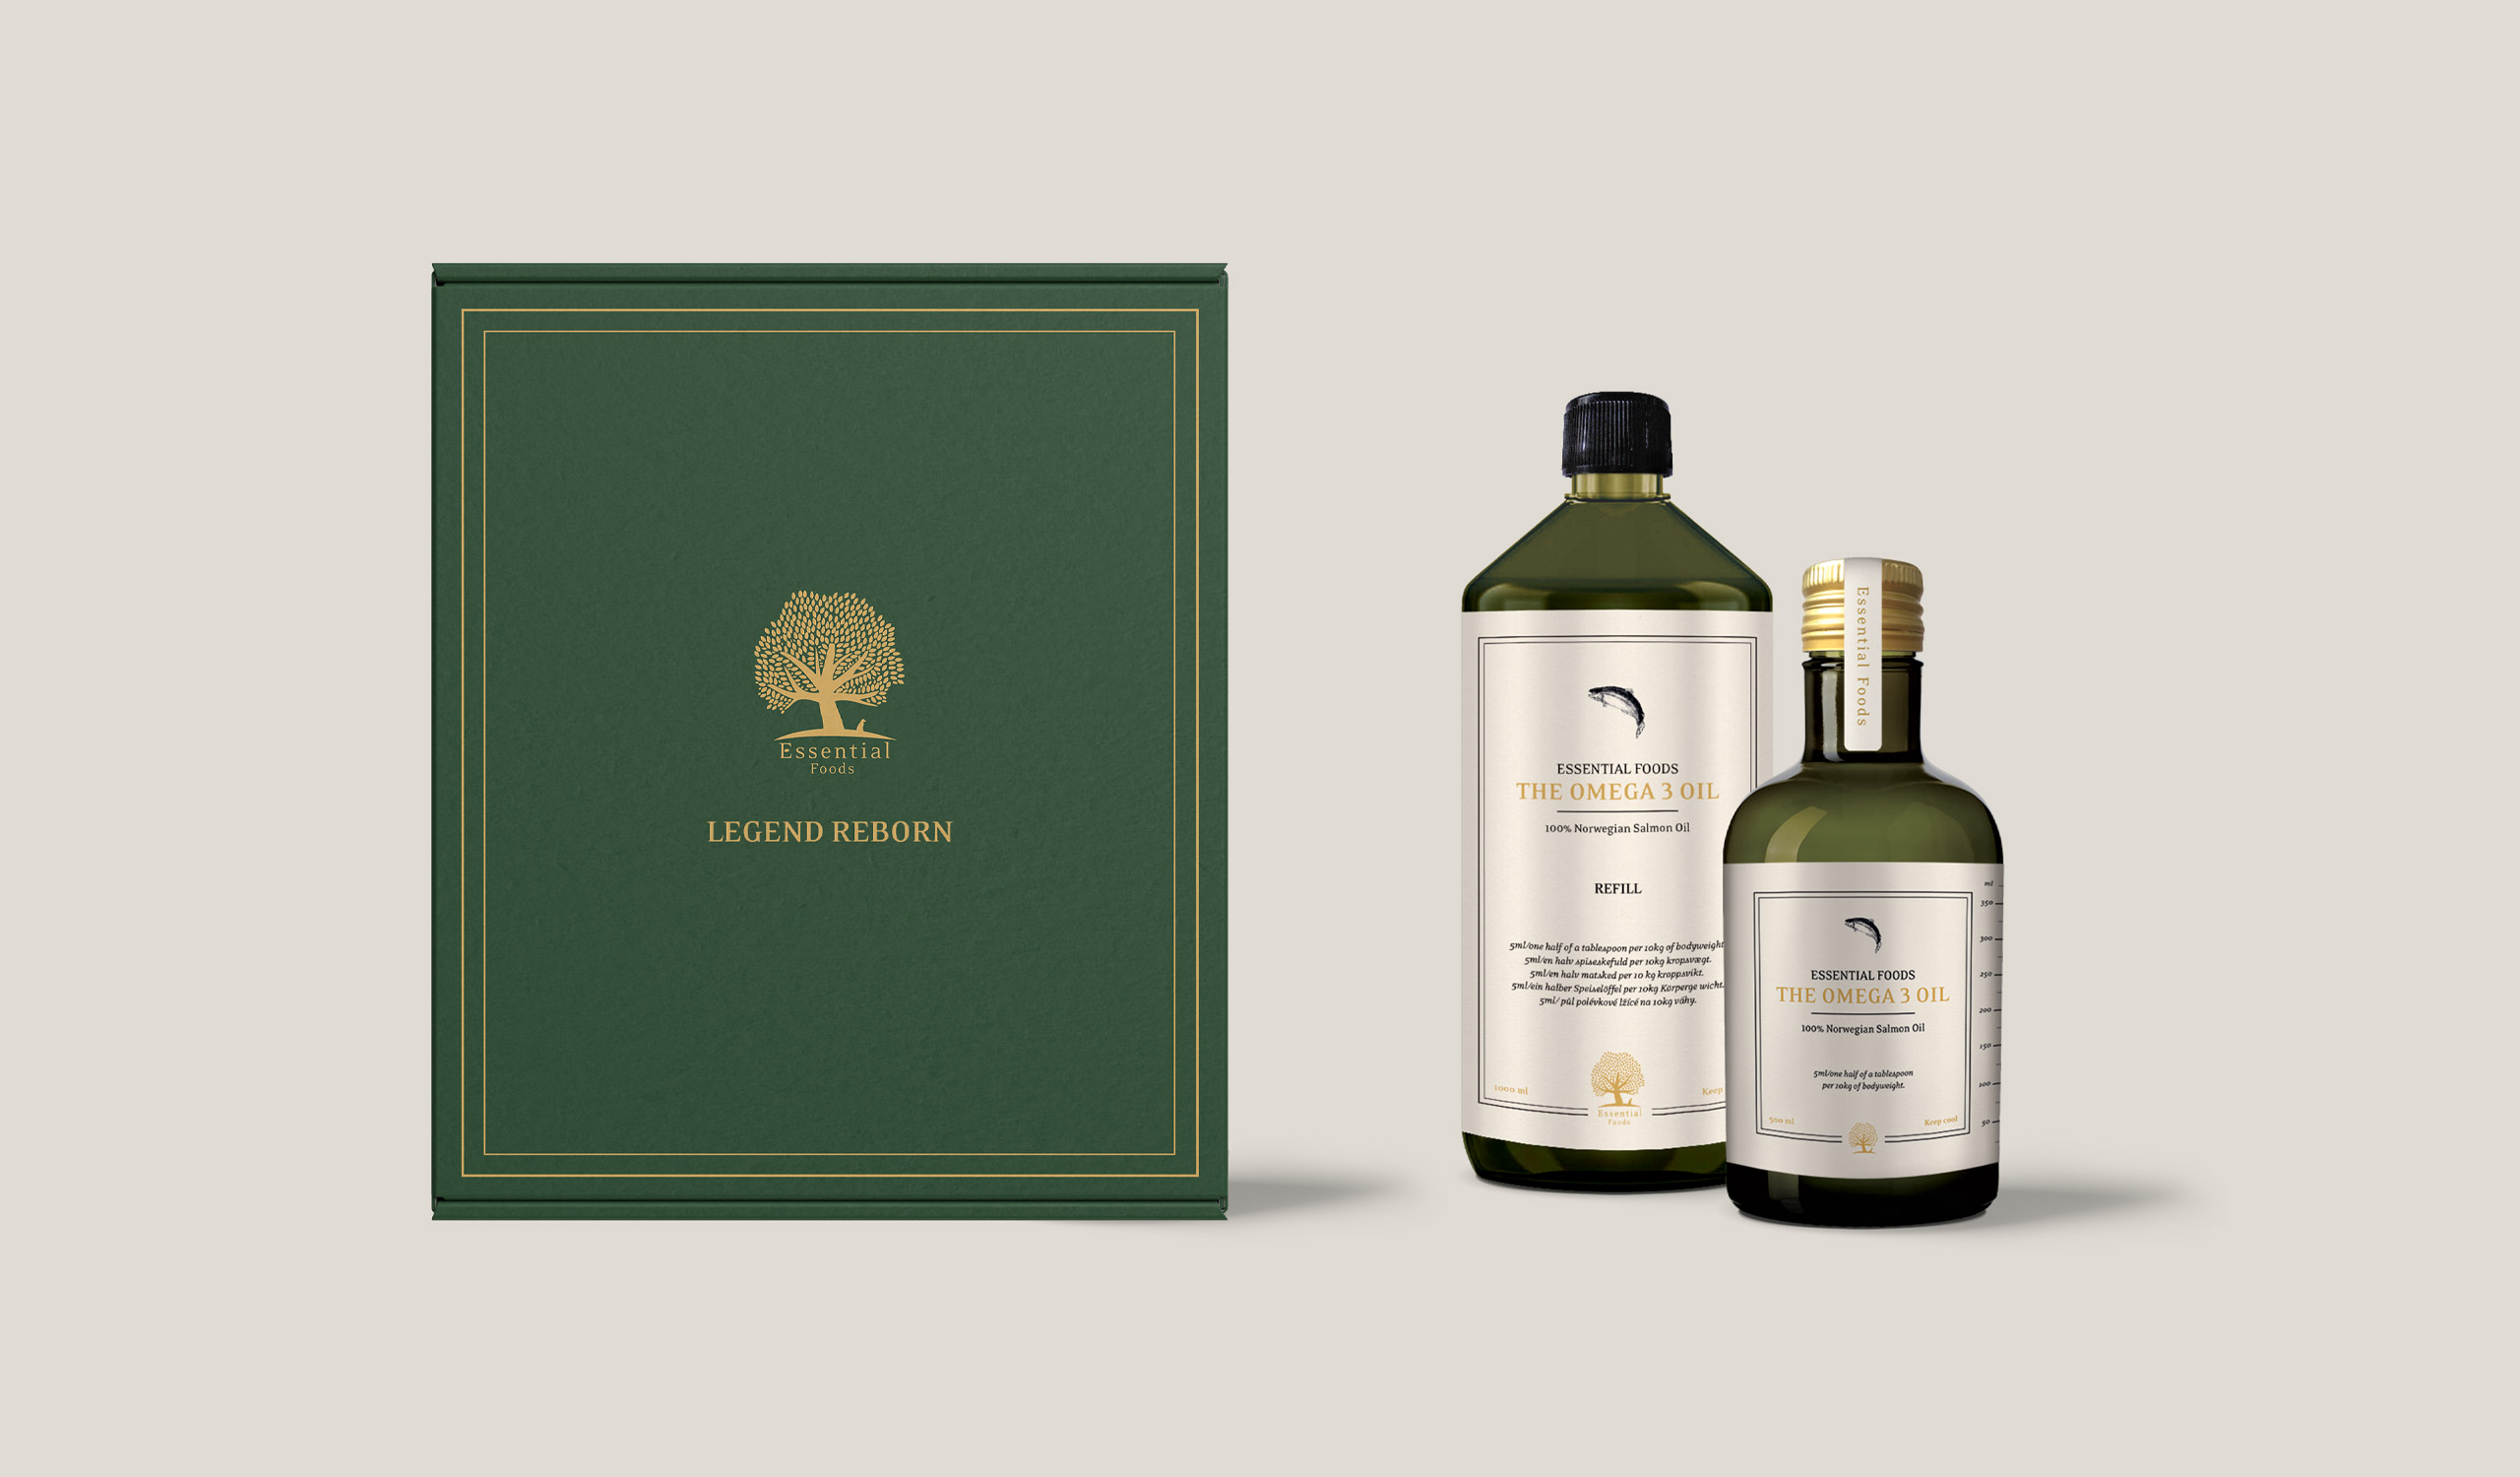 Cardboard box and omega 3 oil